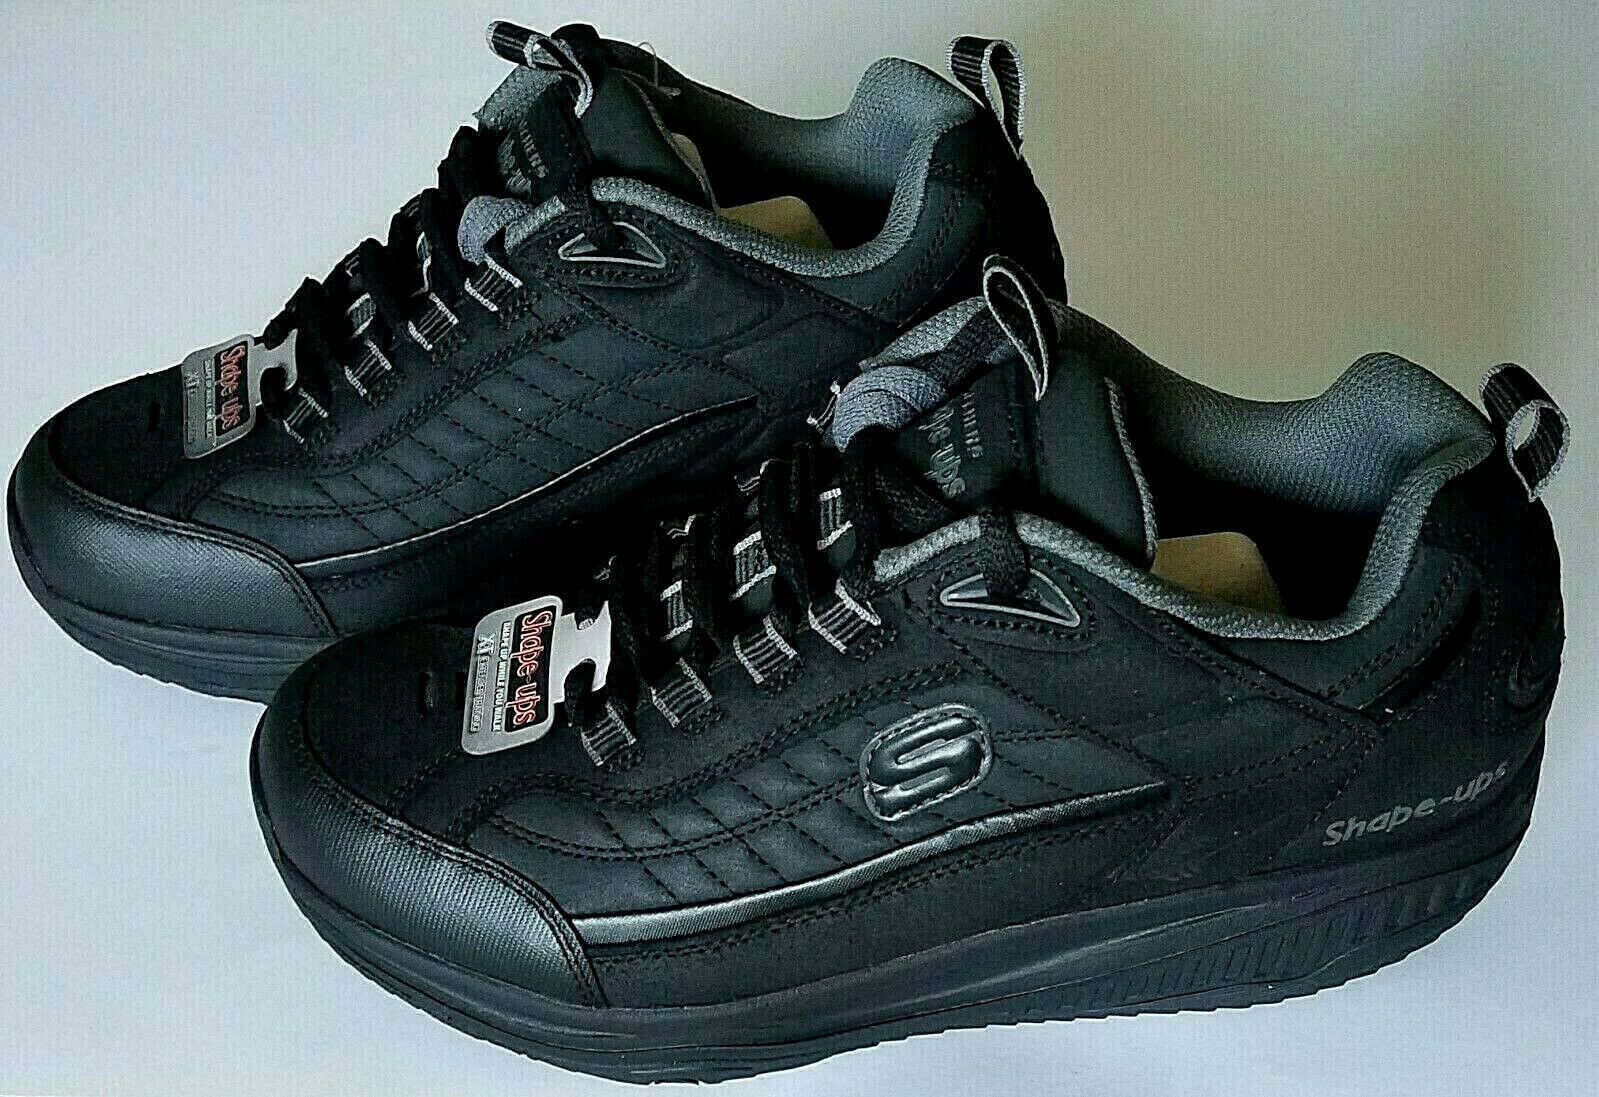 Skechers Shape-Ups XT Negro 52000-negro, para hombres Nuevo Sin Caja